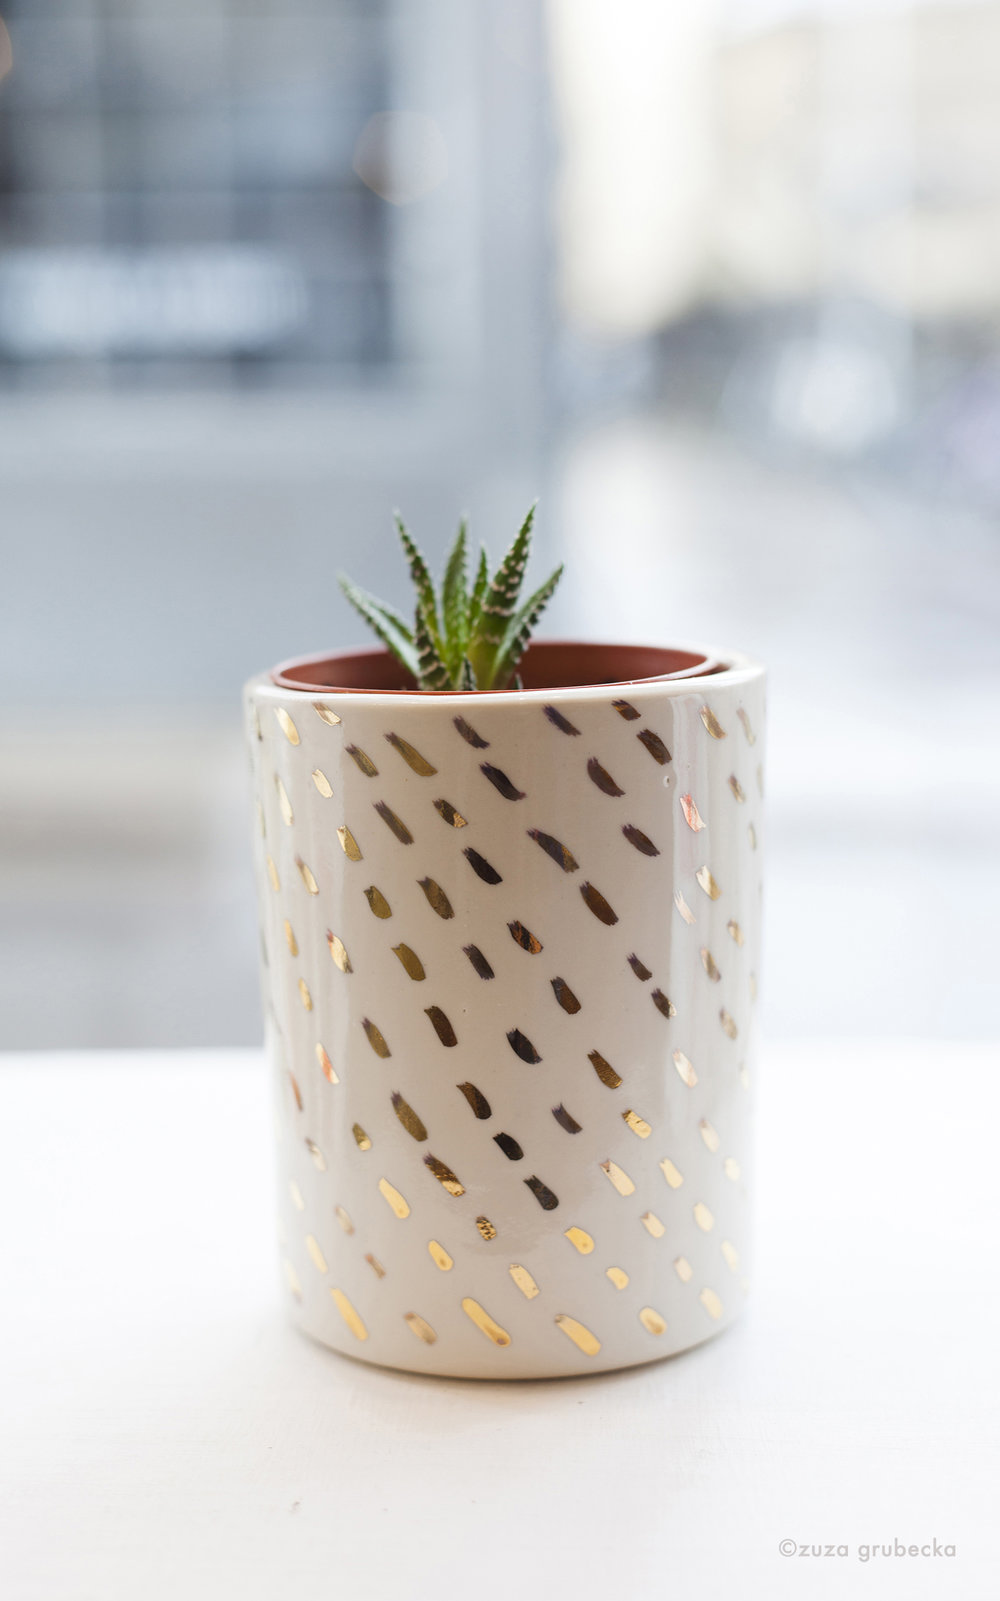 Haworthia Succulent  £5  Pot:  Alice Walton £30